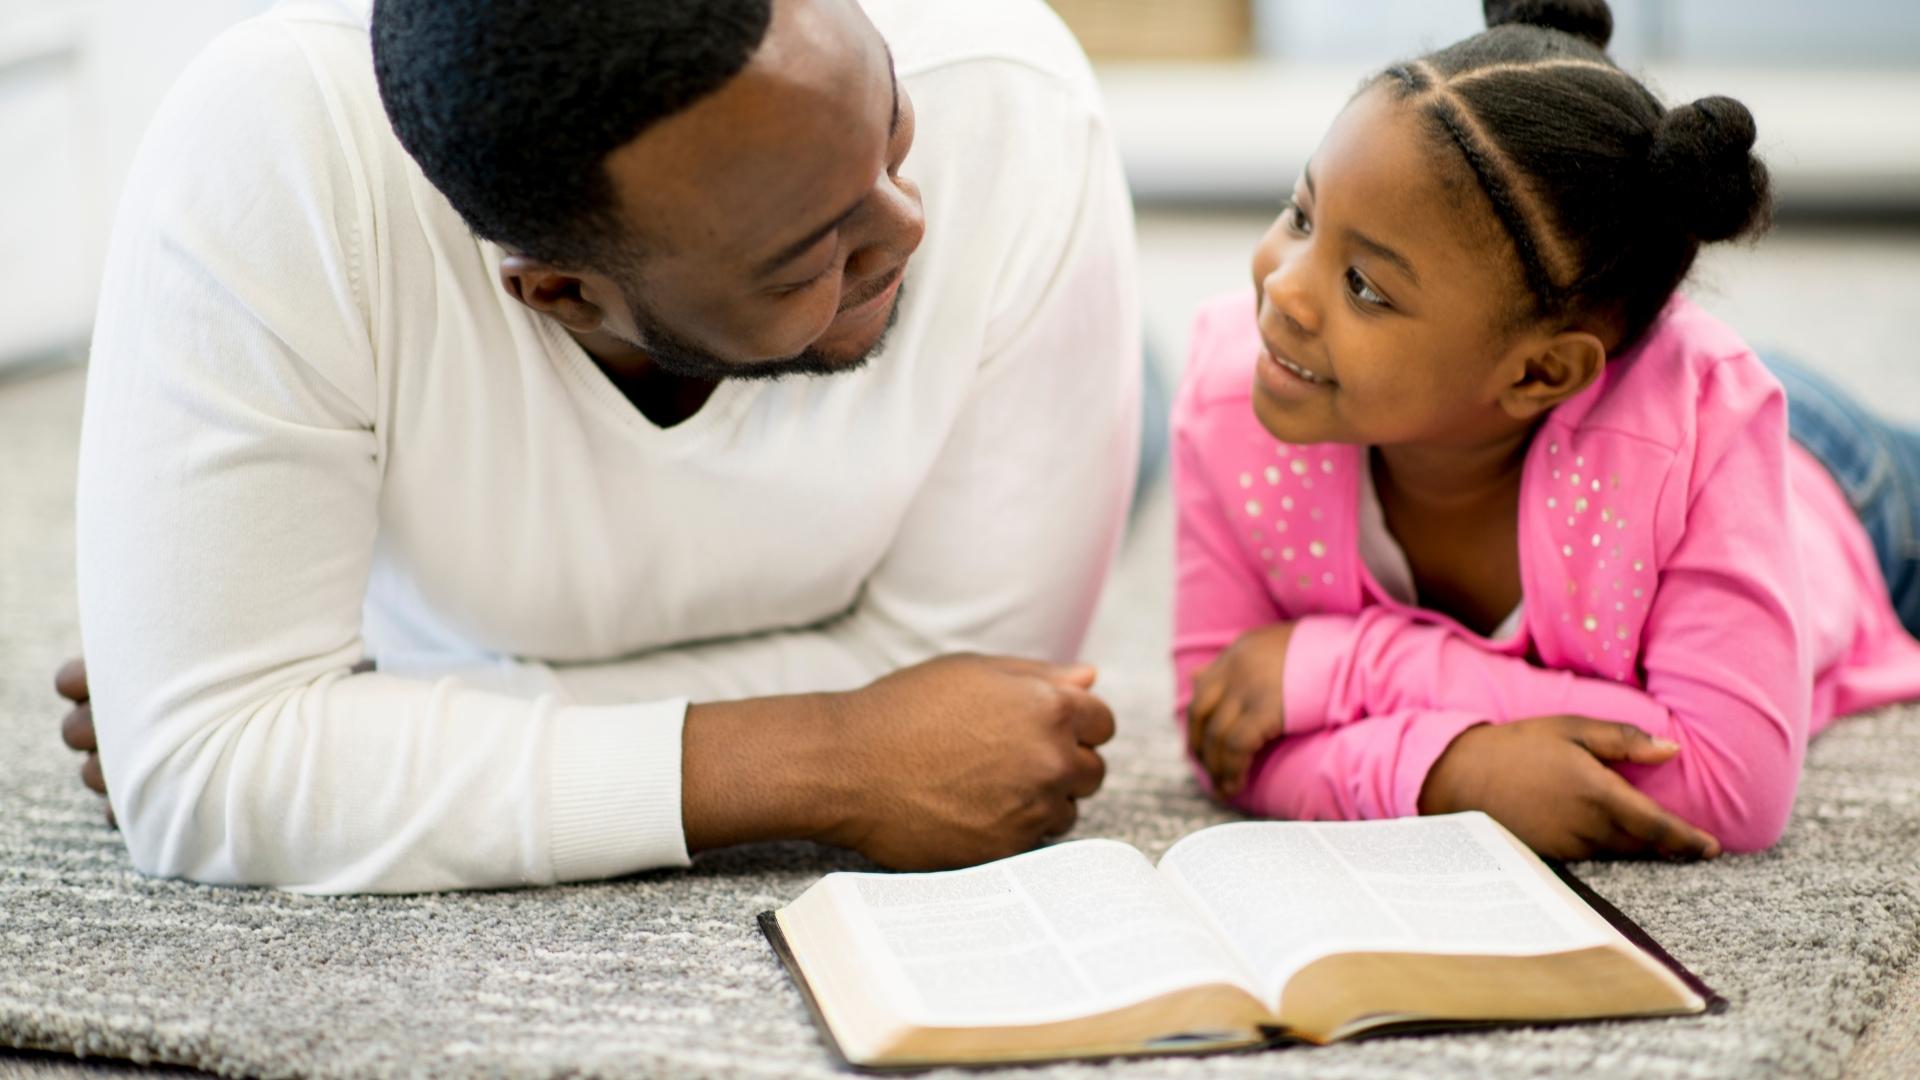 Biblia religion o sabiduria